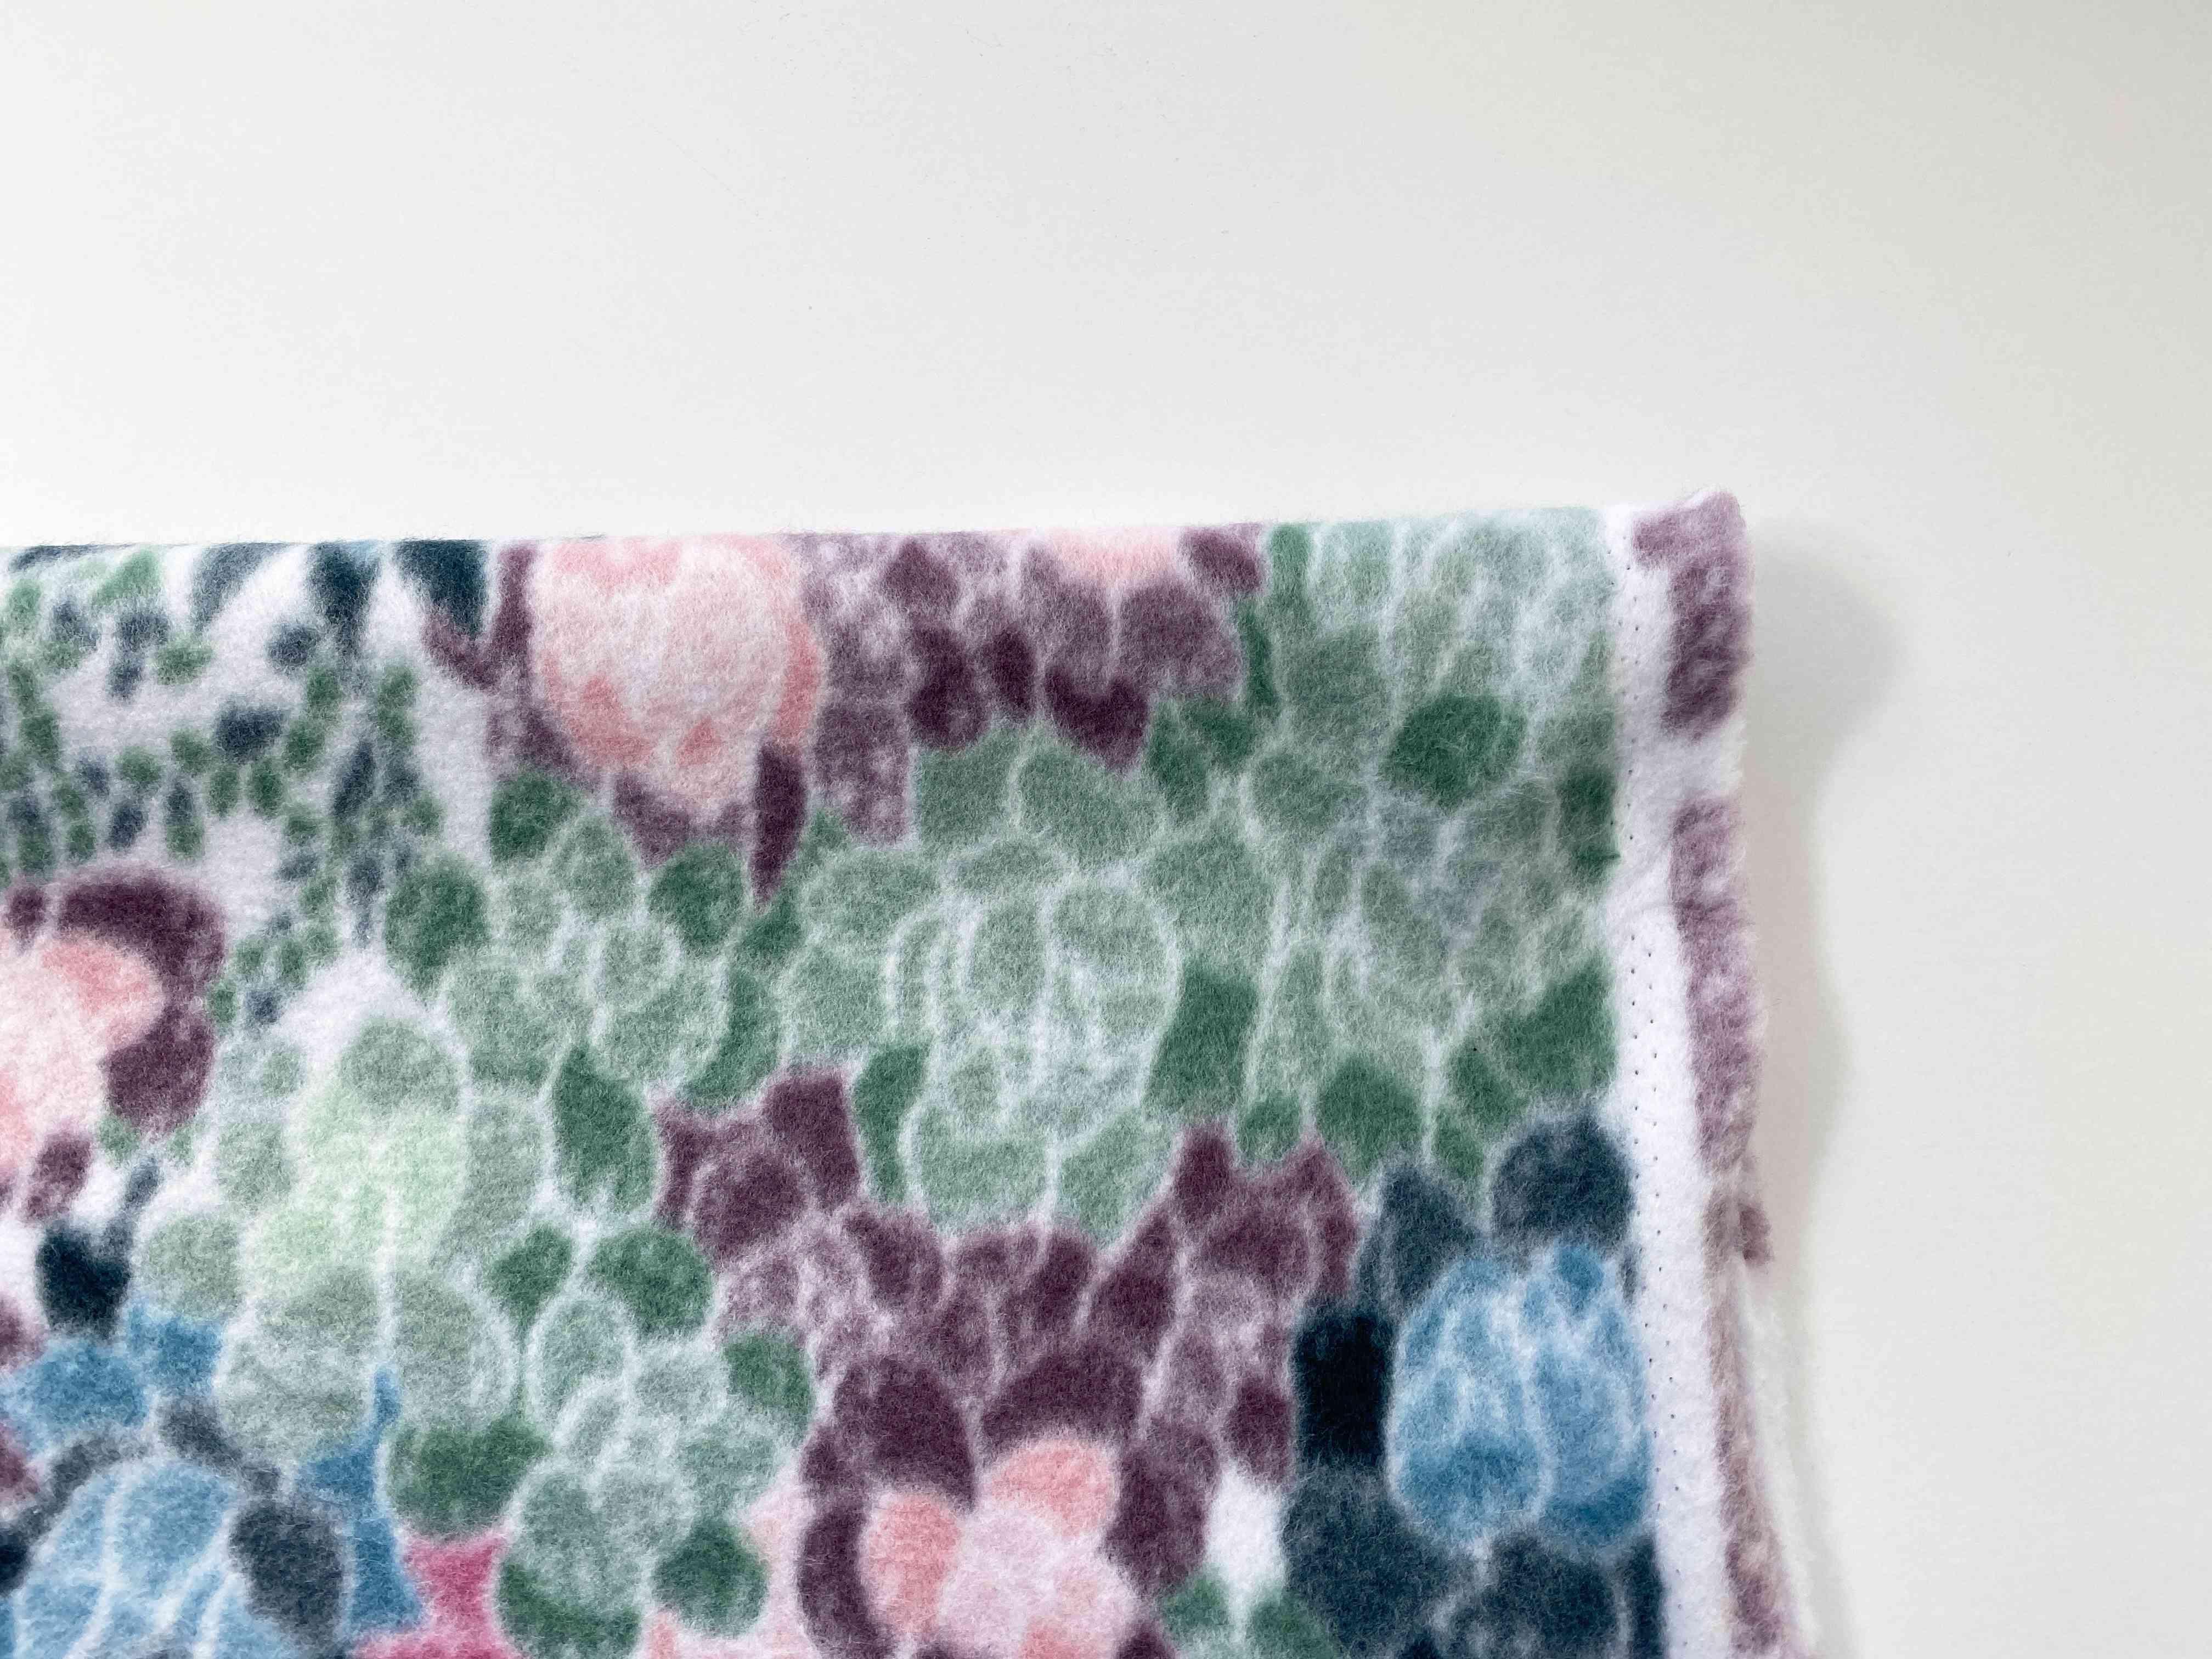 Folded fleece fabric